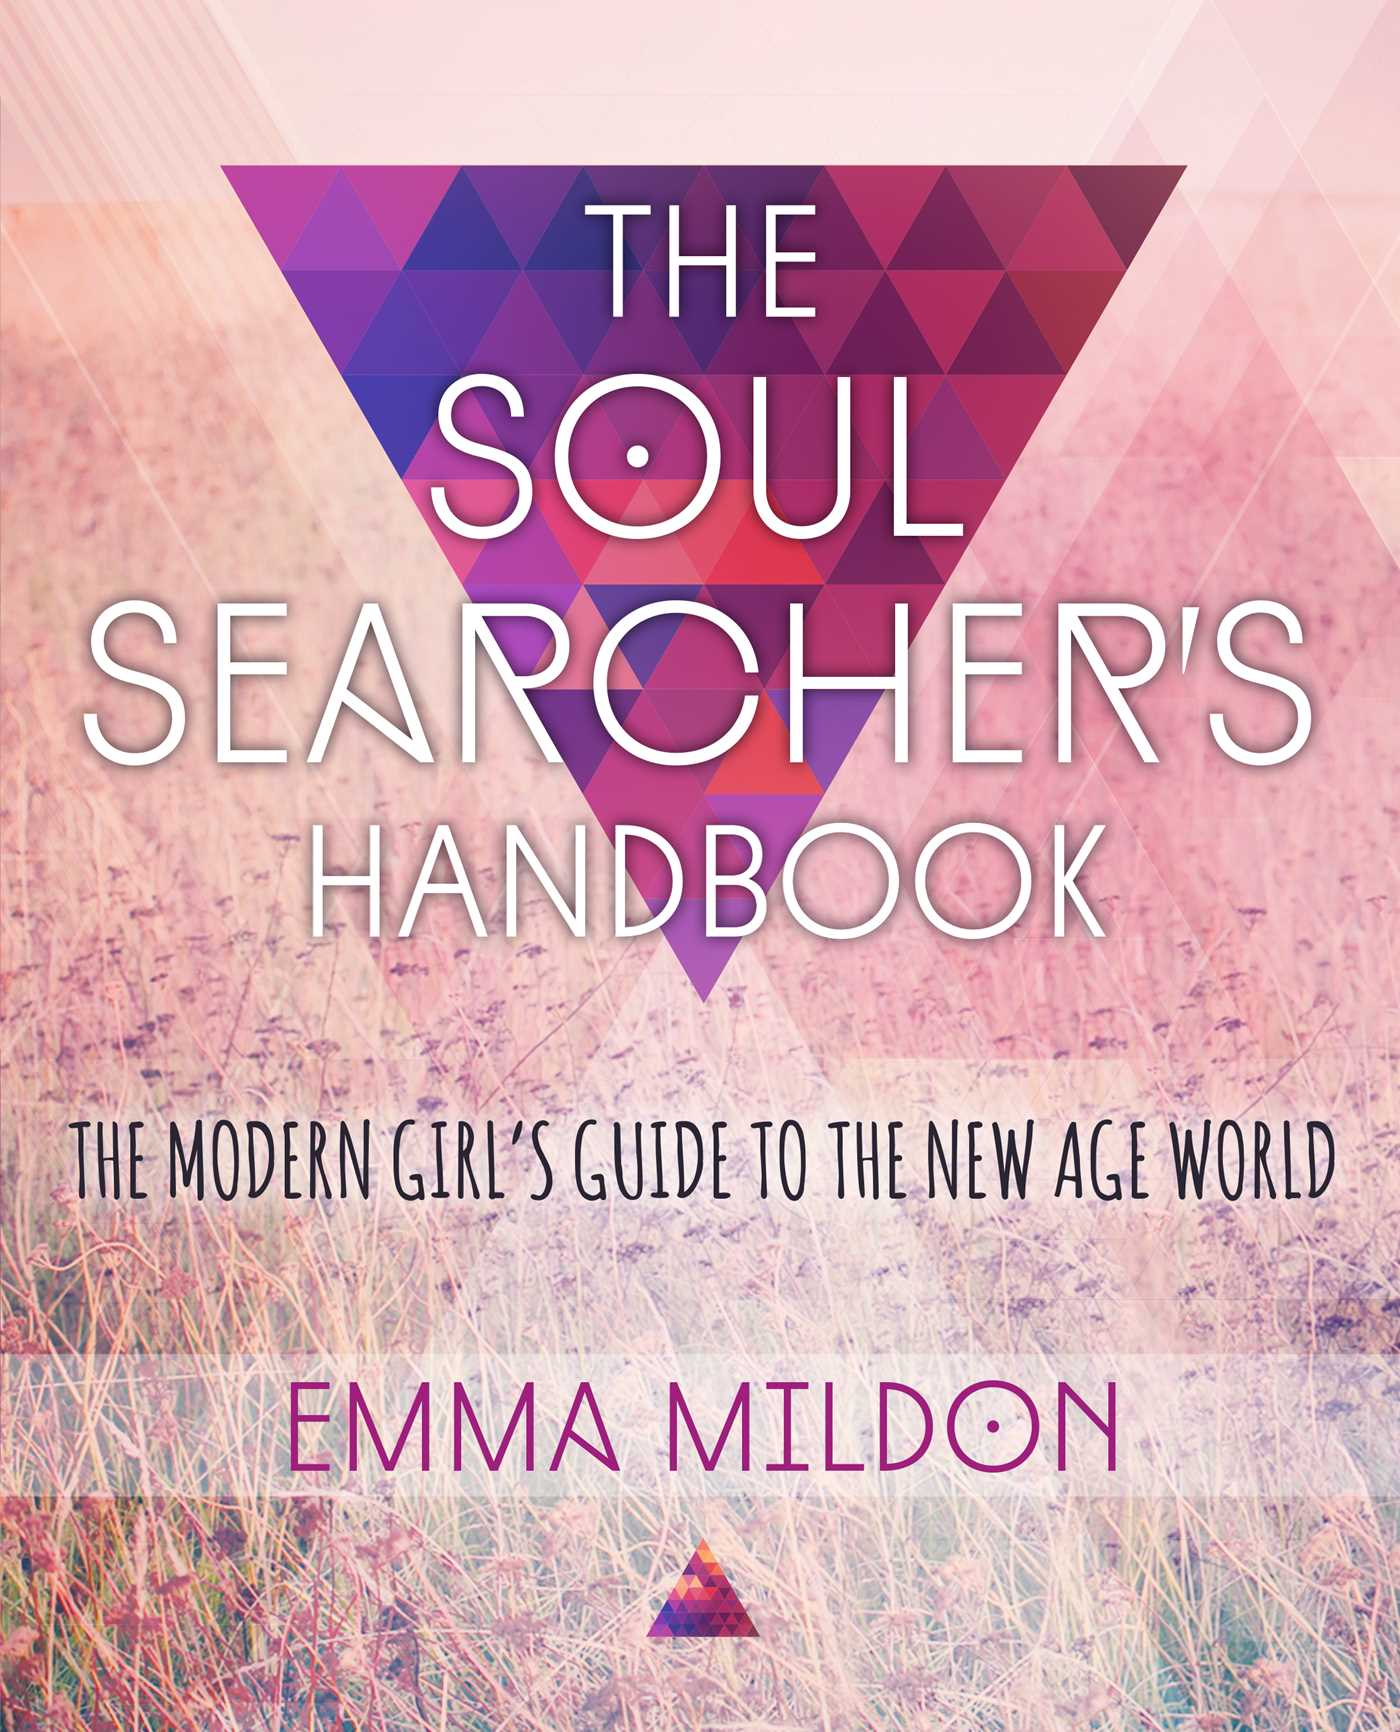 The soul searchers handbook 9781582705248 hr